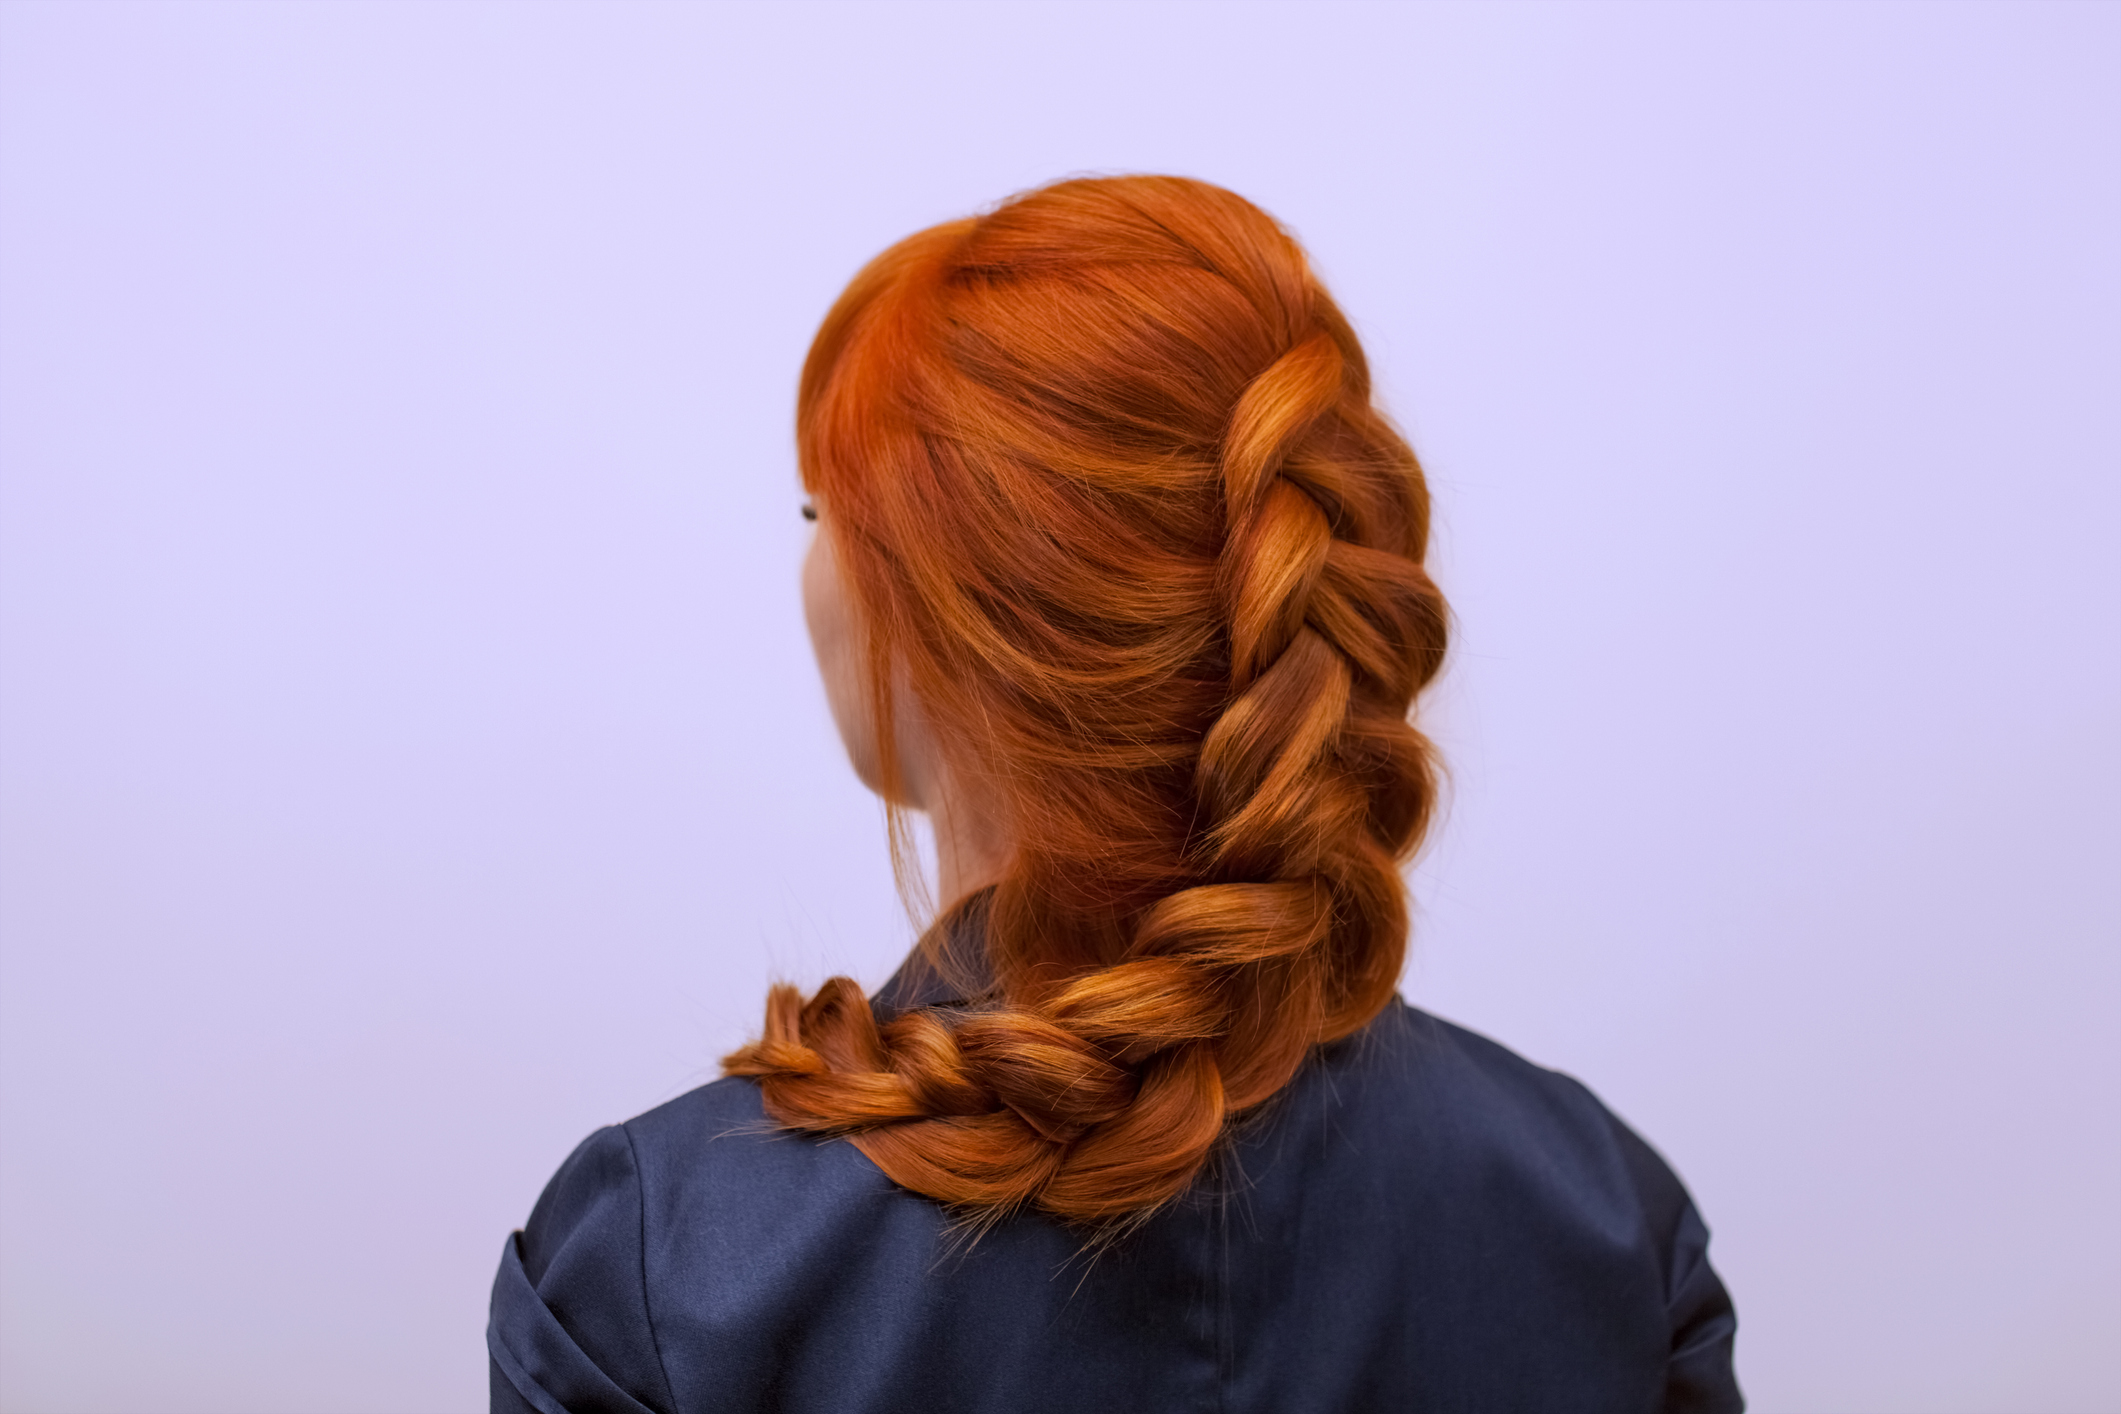 Dragon Hair So Stylst Du Dir Die Flechtfrisur Desiredde